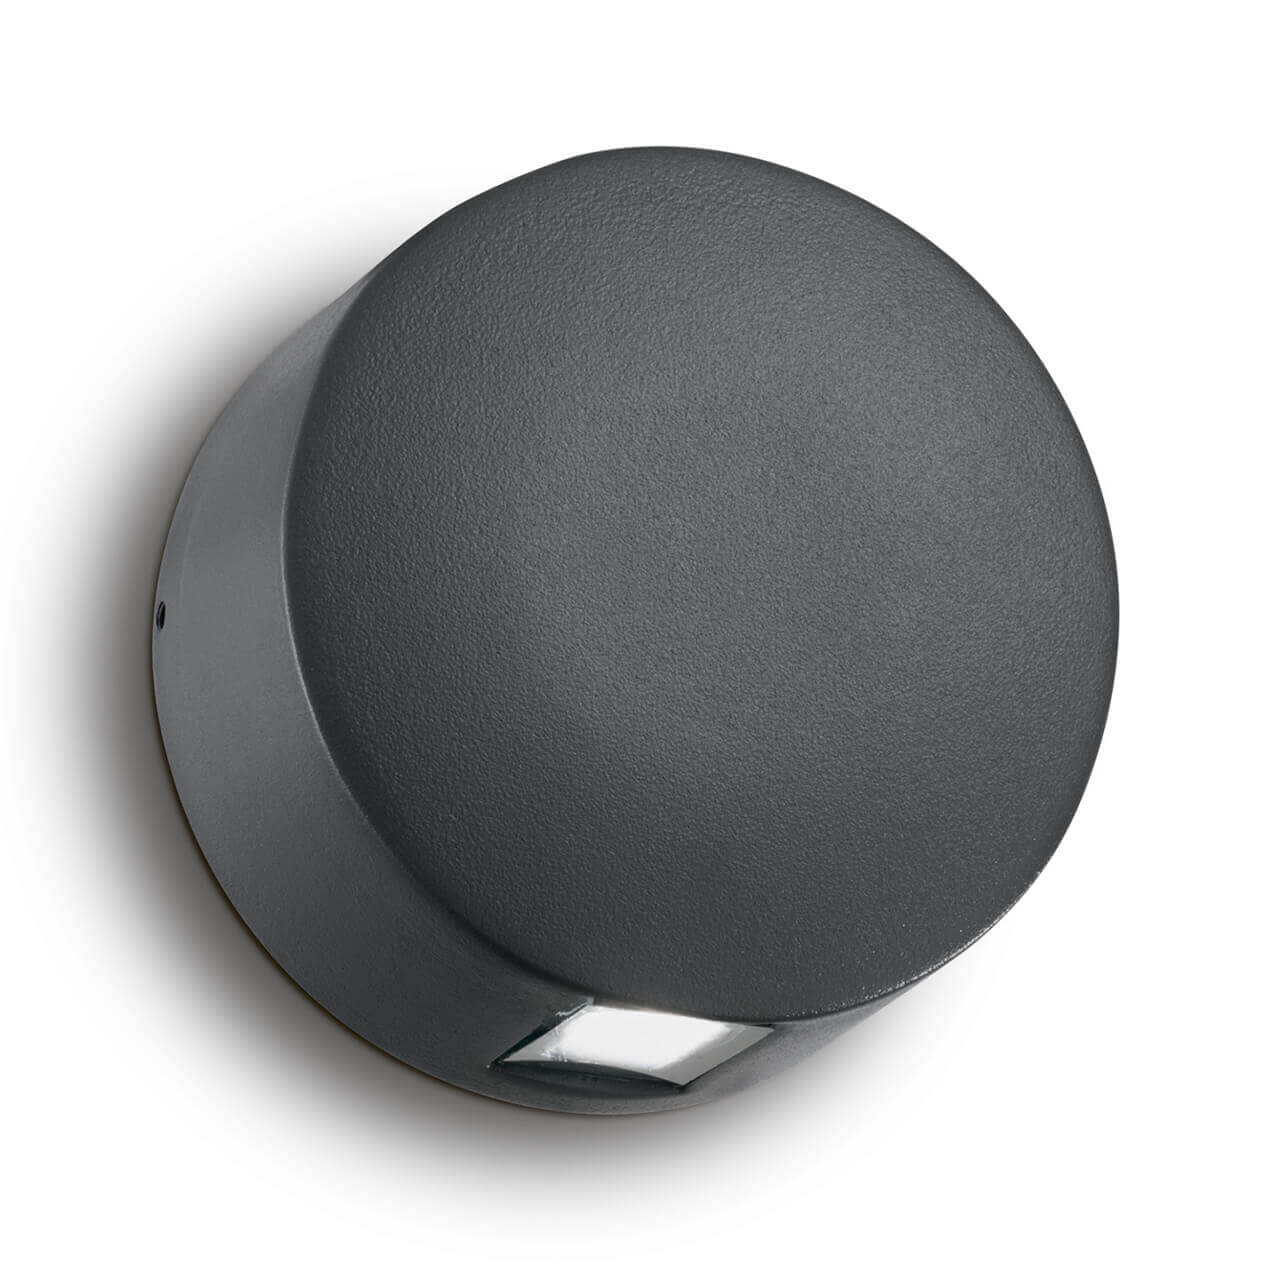 Светильник Ideal Lux Dot Ap2 Antracite Dot Antracite